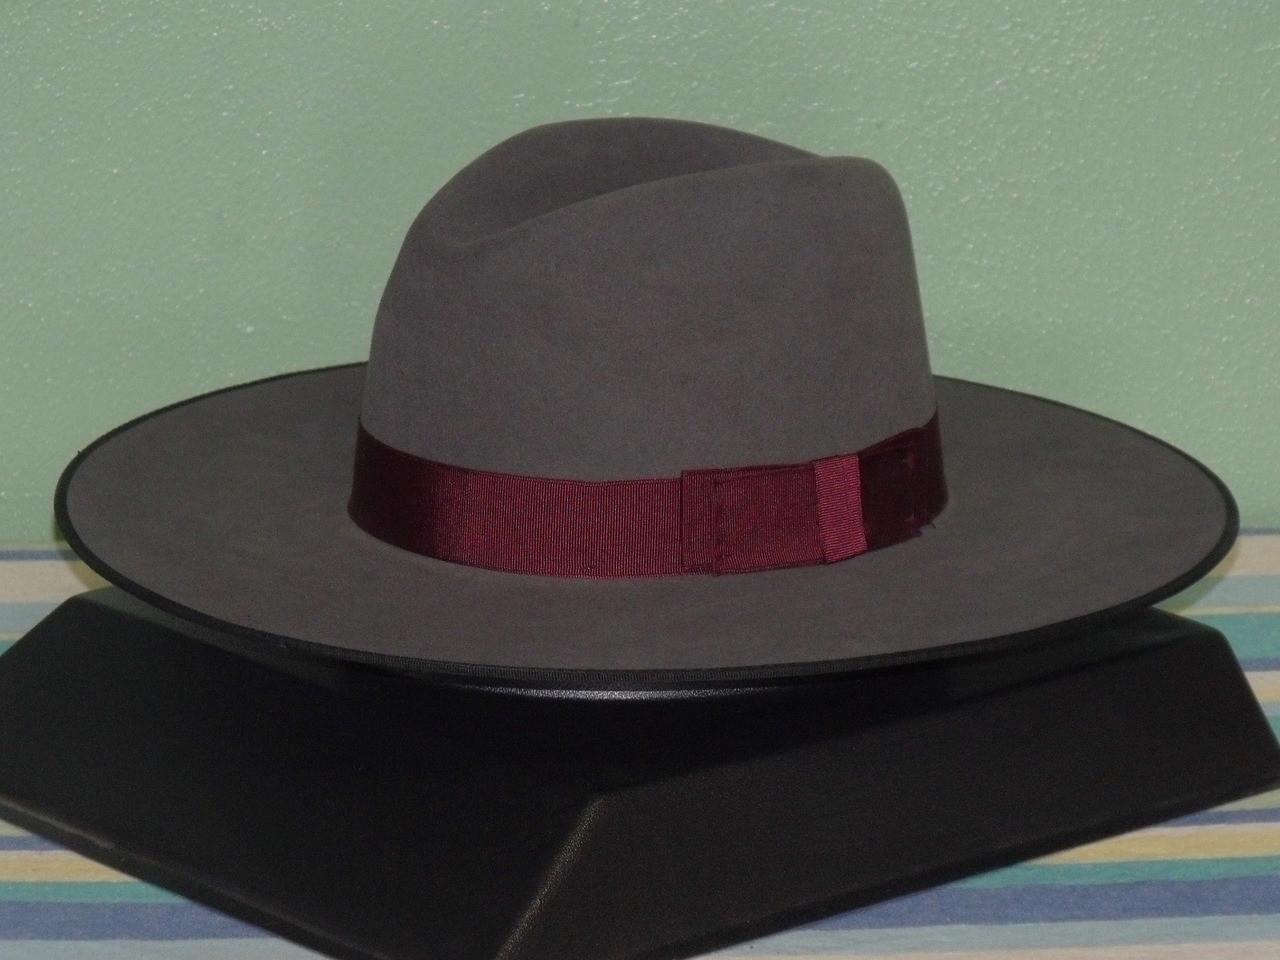 ea1f9061df6a1 Stetson Tri-City Wide Brim Fur Fedora Hat - One 2 mini Ranch